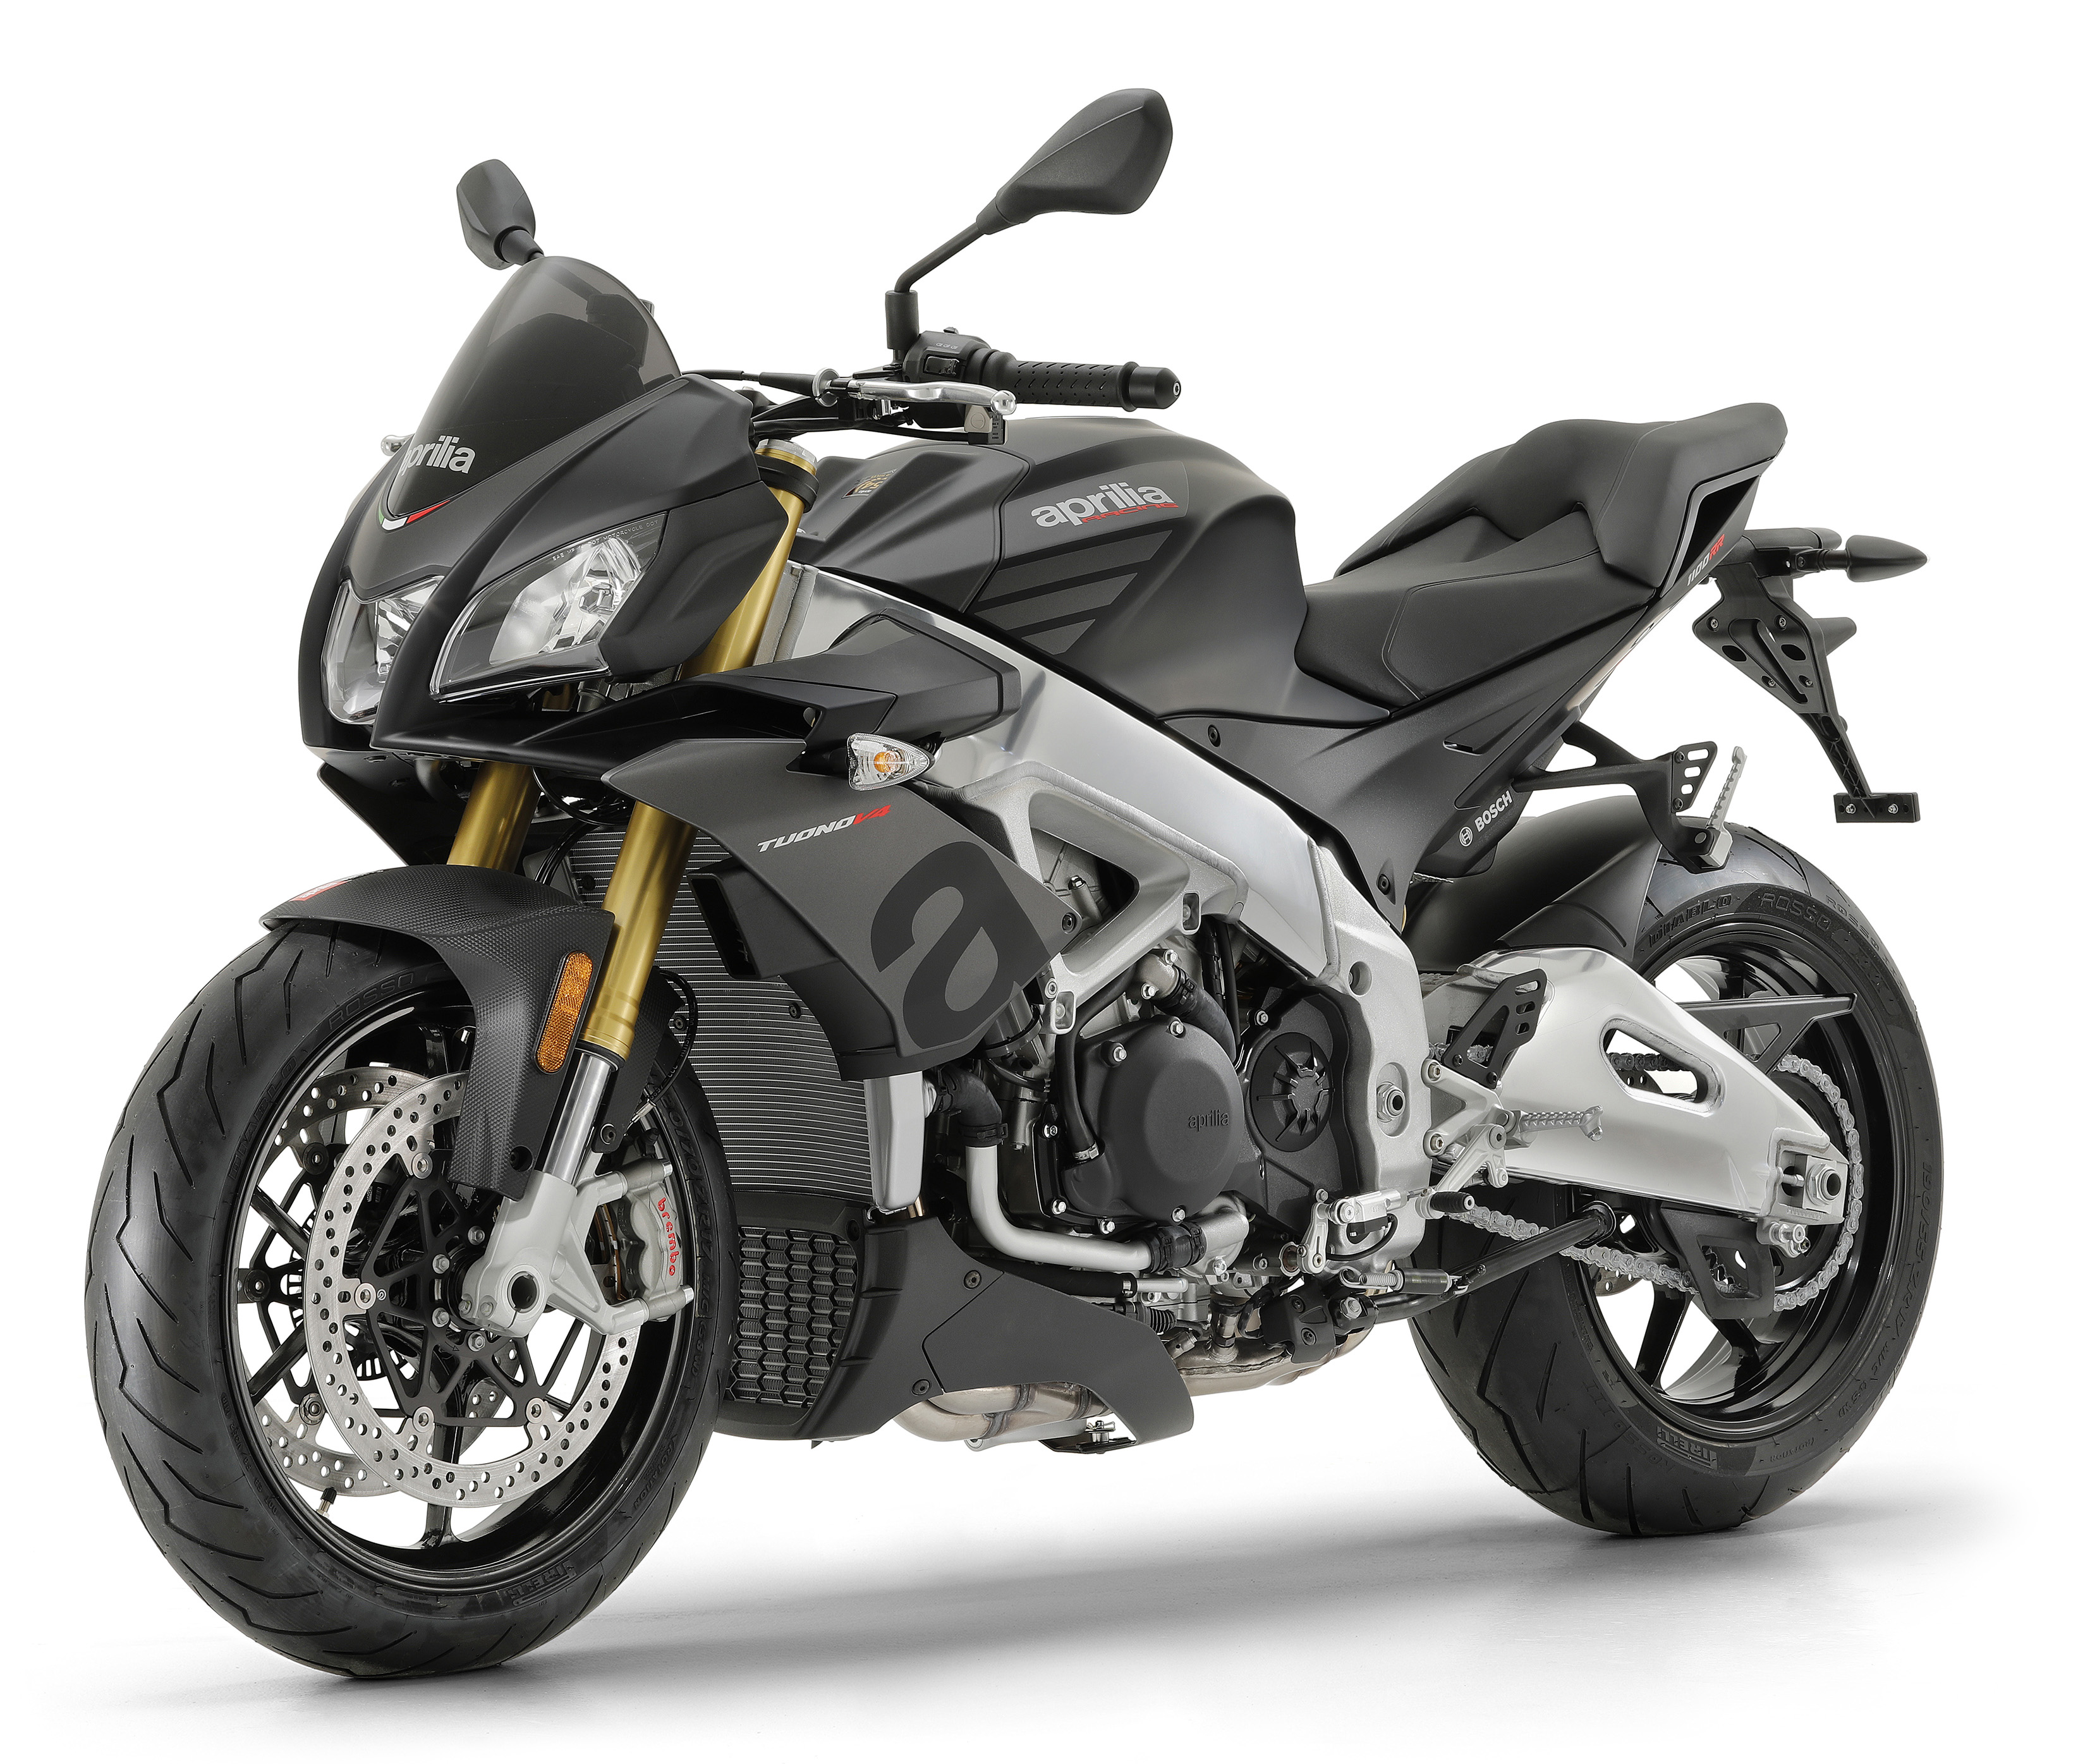 2020 Aprilia Tuono 1100 Factory 1100 Rr Cycle World